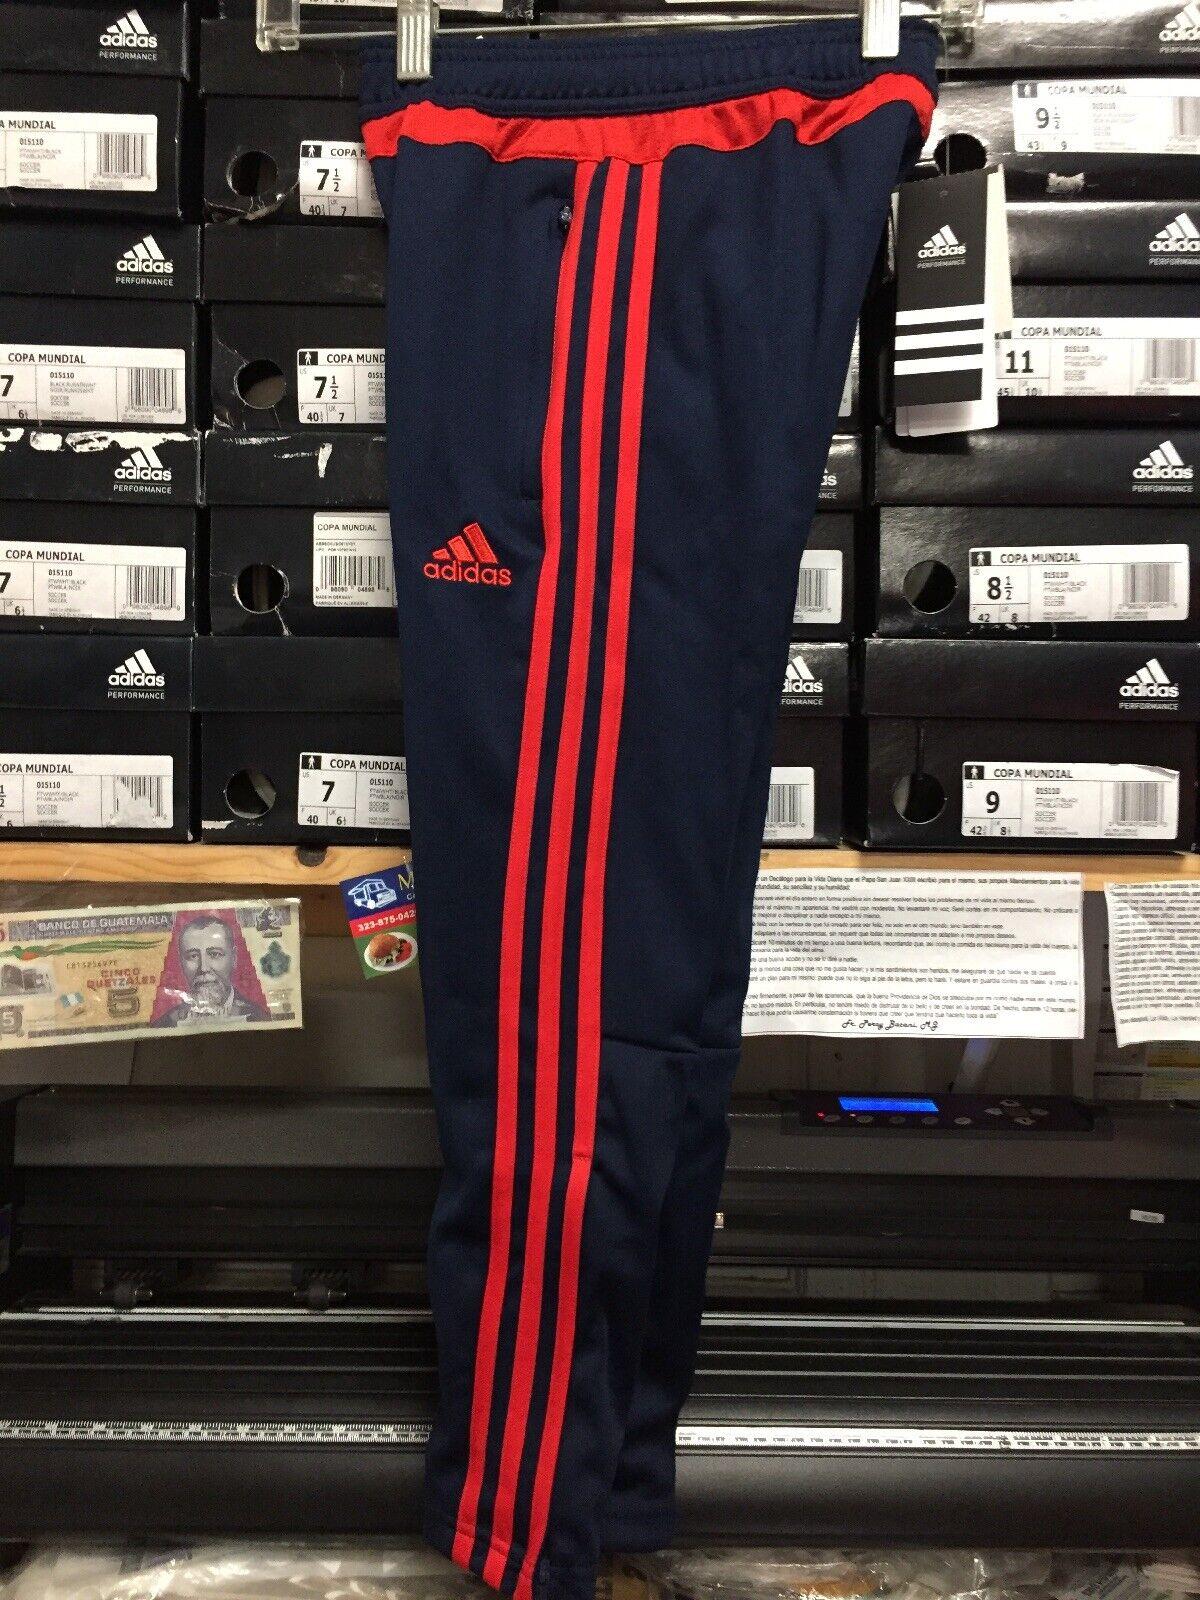 Adidas Tiro 15 Trg Pants Pantalon Adidas Juvenil Navy blueee Red Size Youth XS